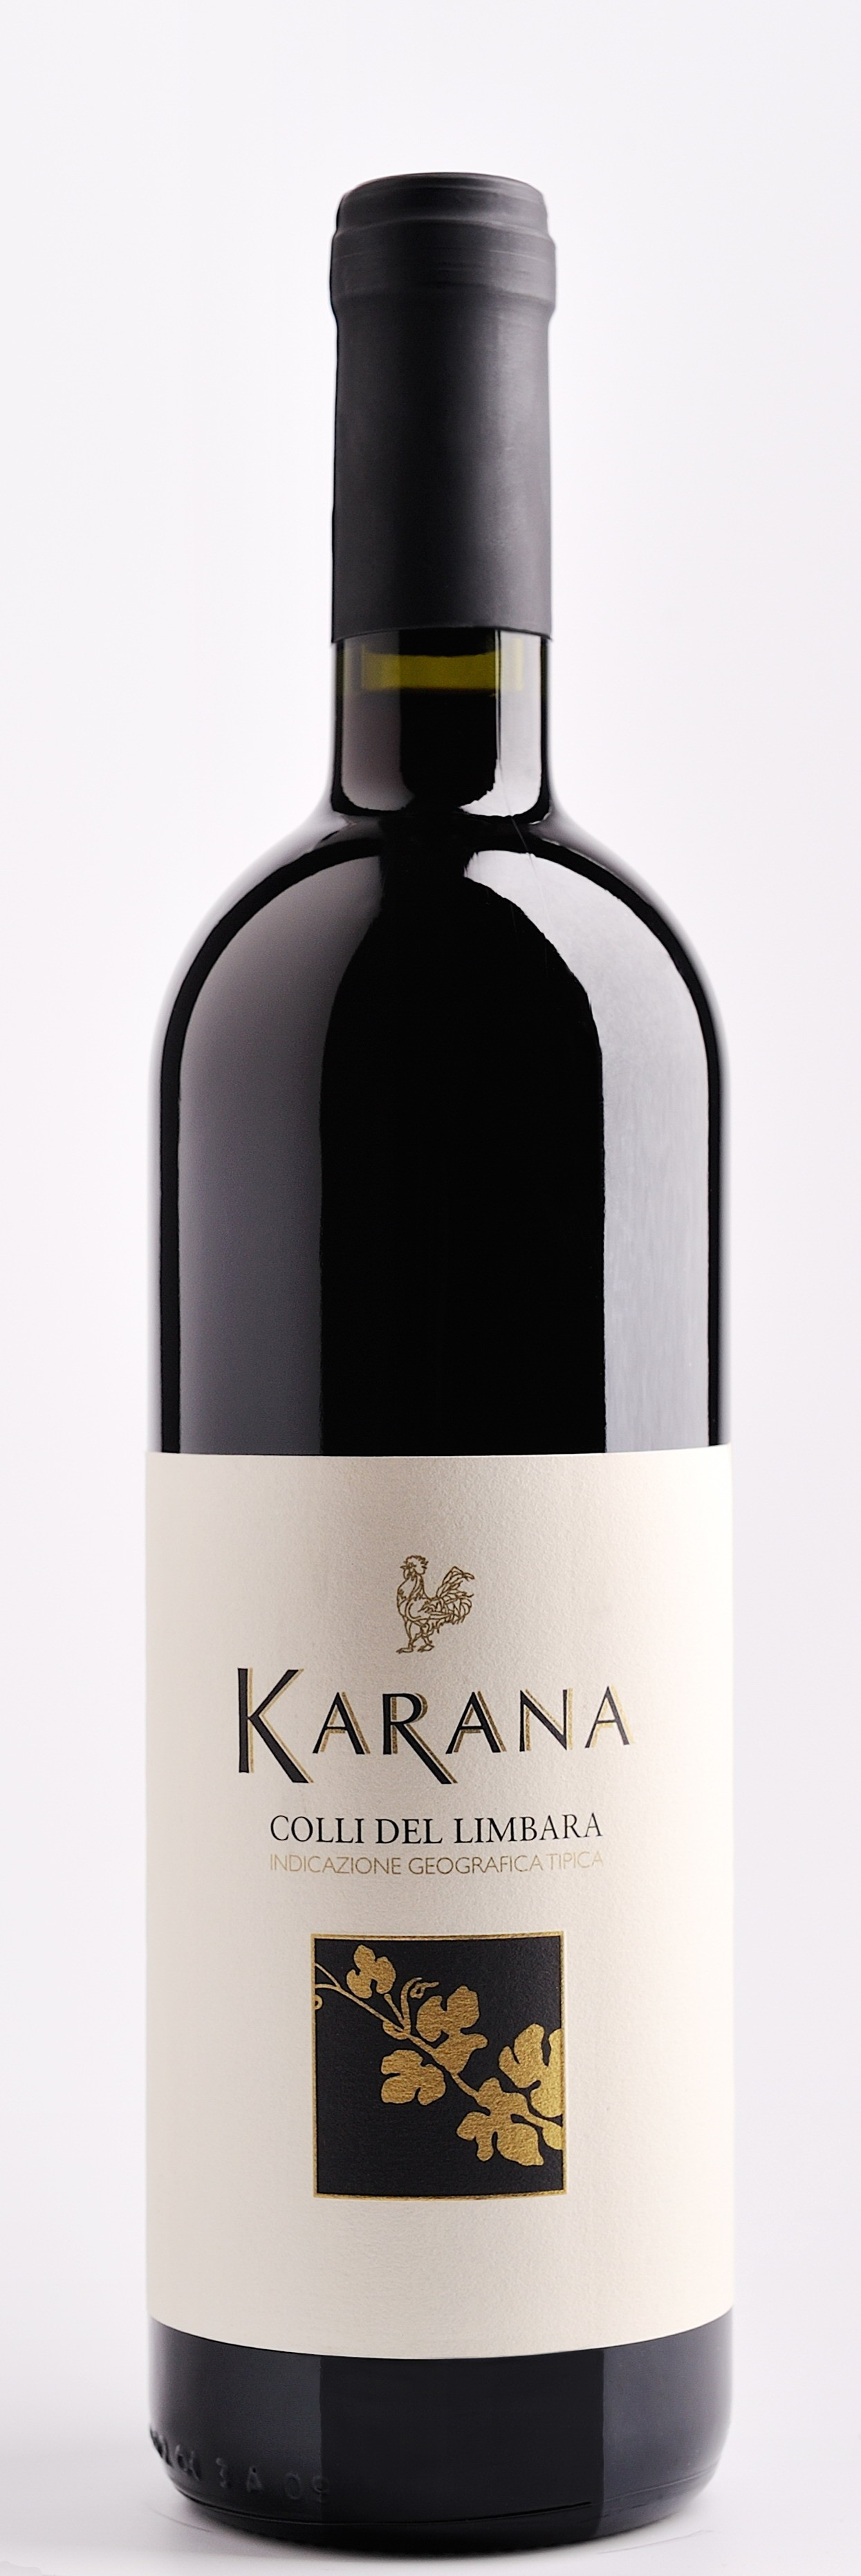 http://www.wineandgallery.cz/301-thickbox_default/karana-nebbiolo-igt.jpg